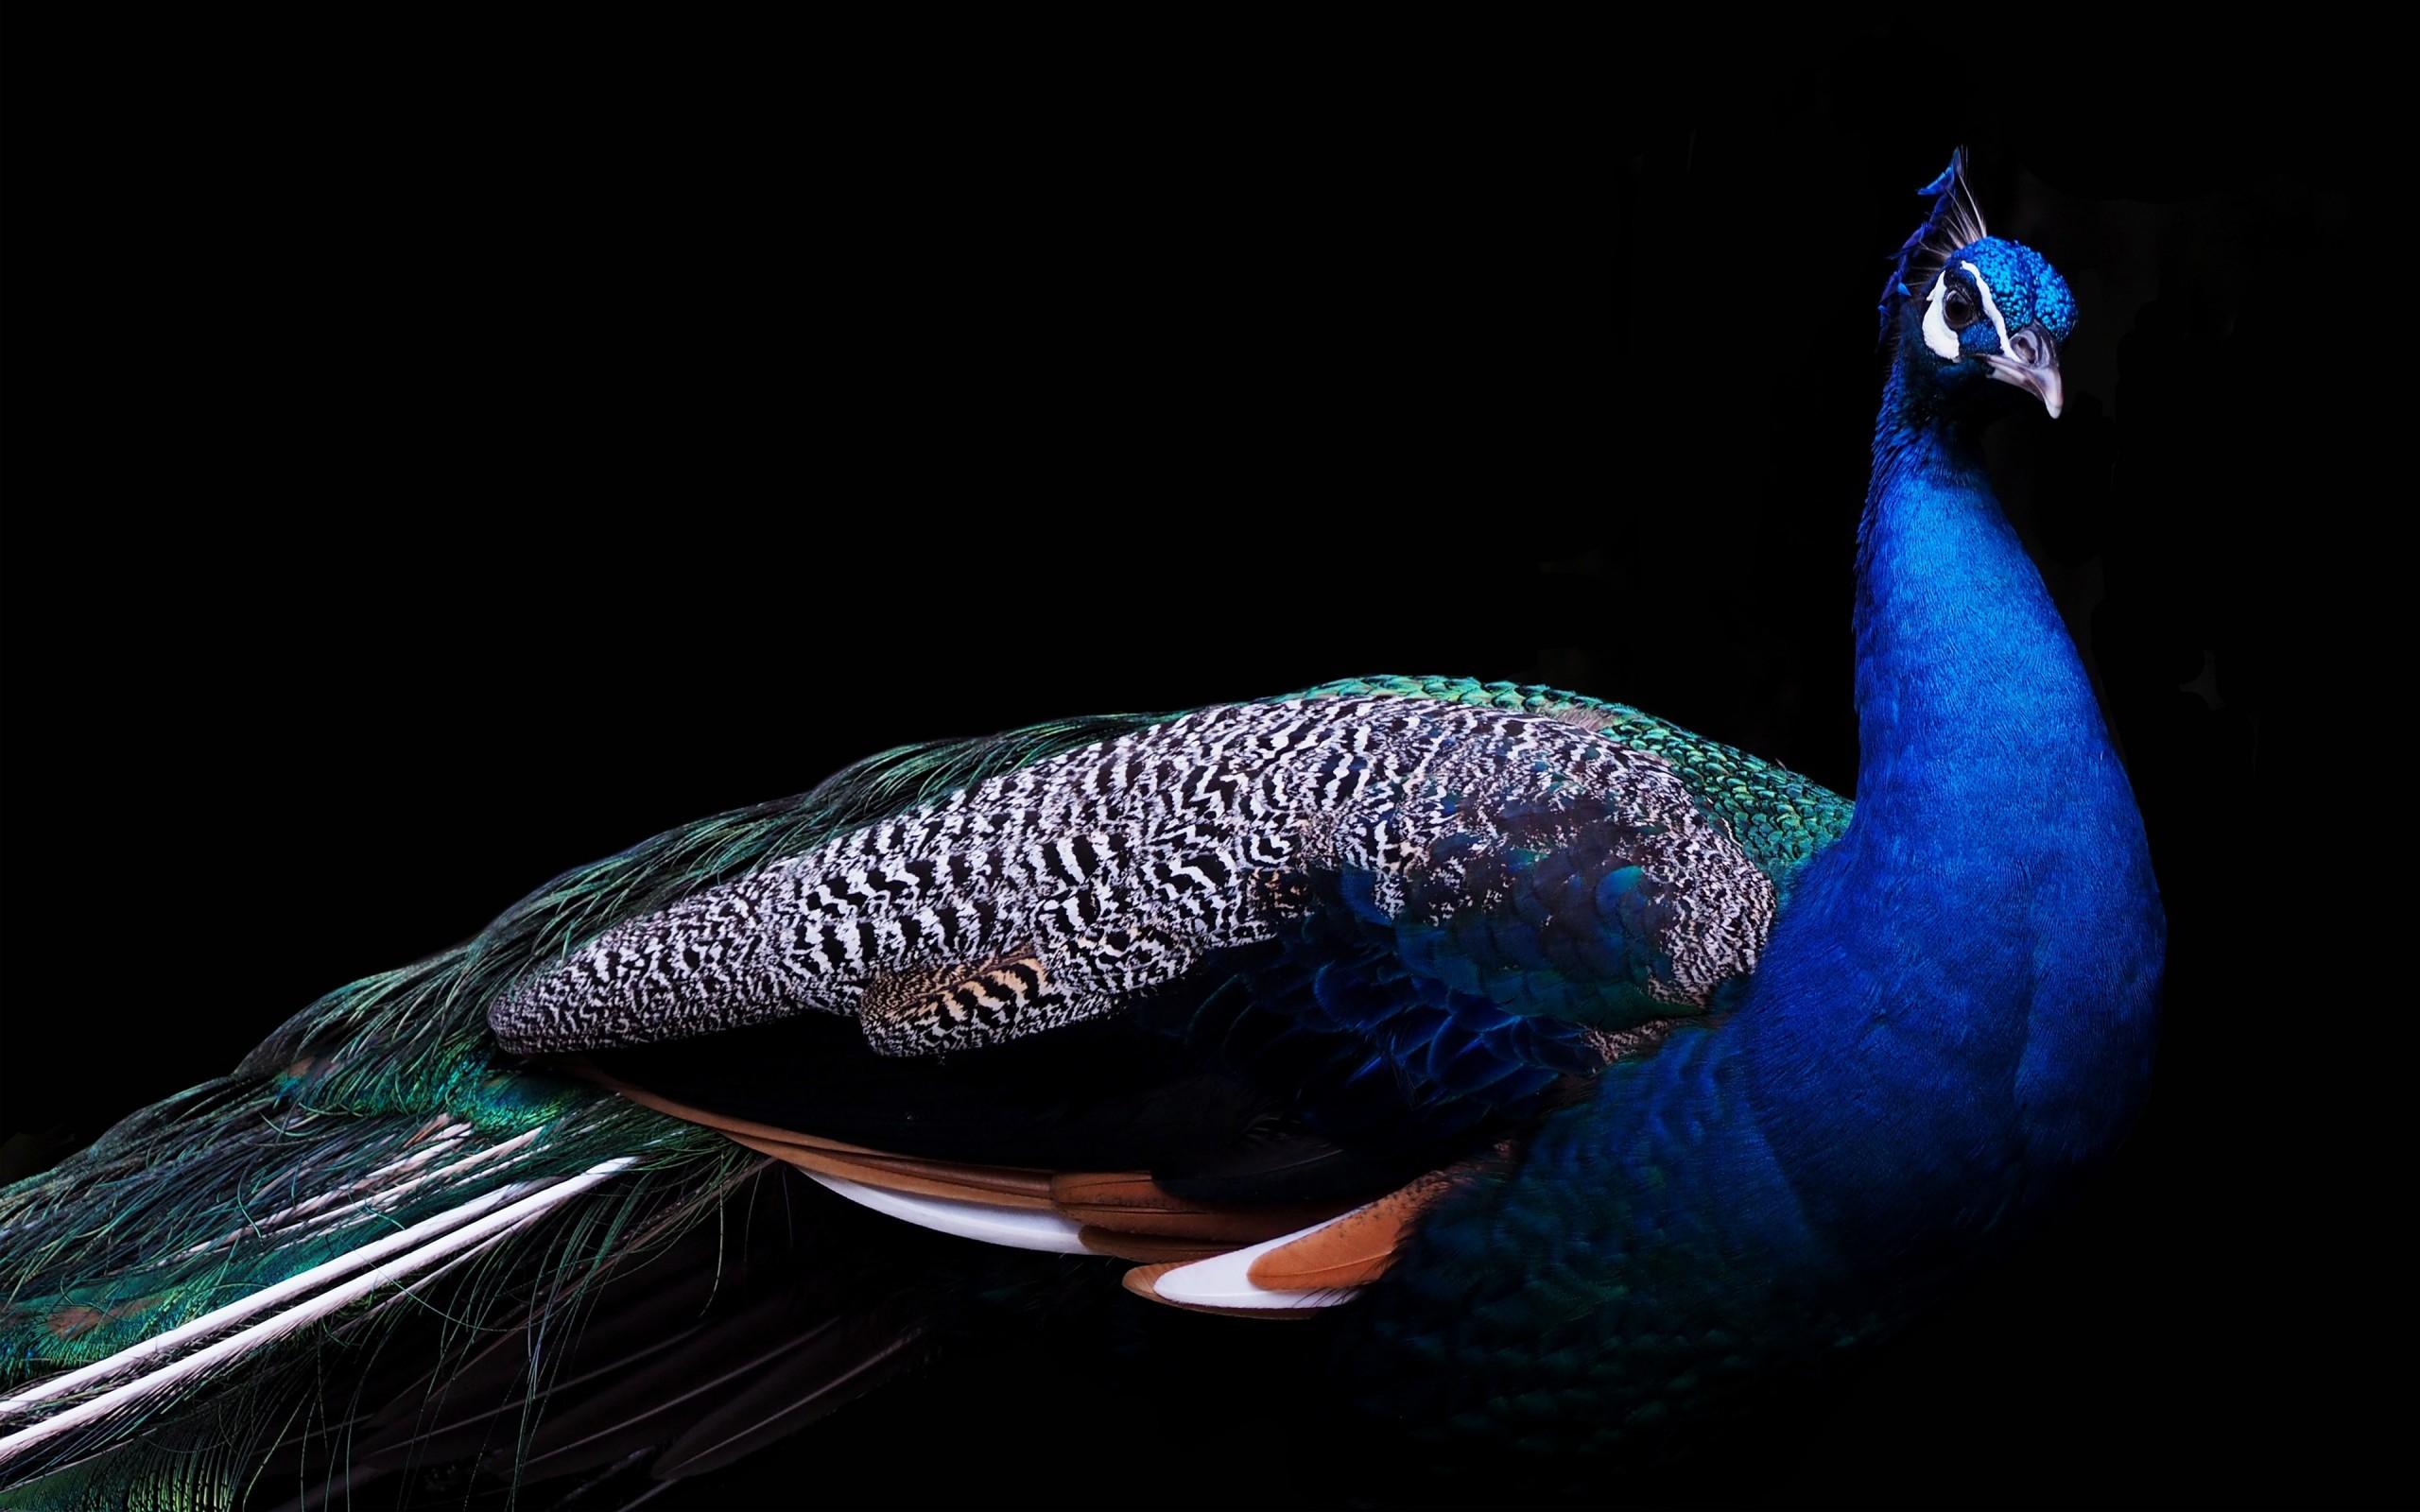 Beautiful Peacock 4K Wallpapers HD Wallpapers ID 21135